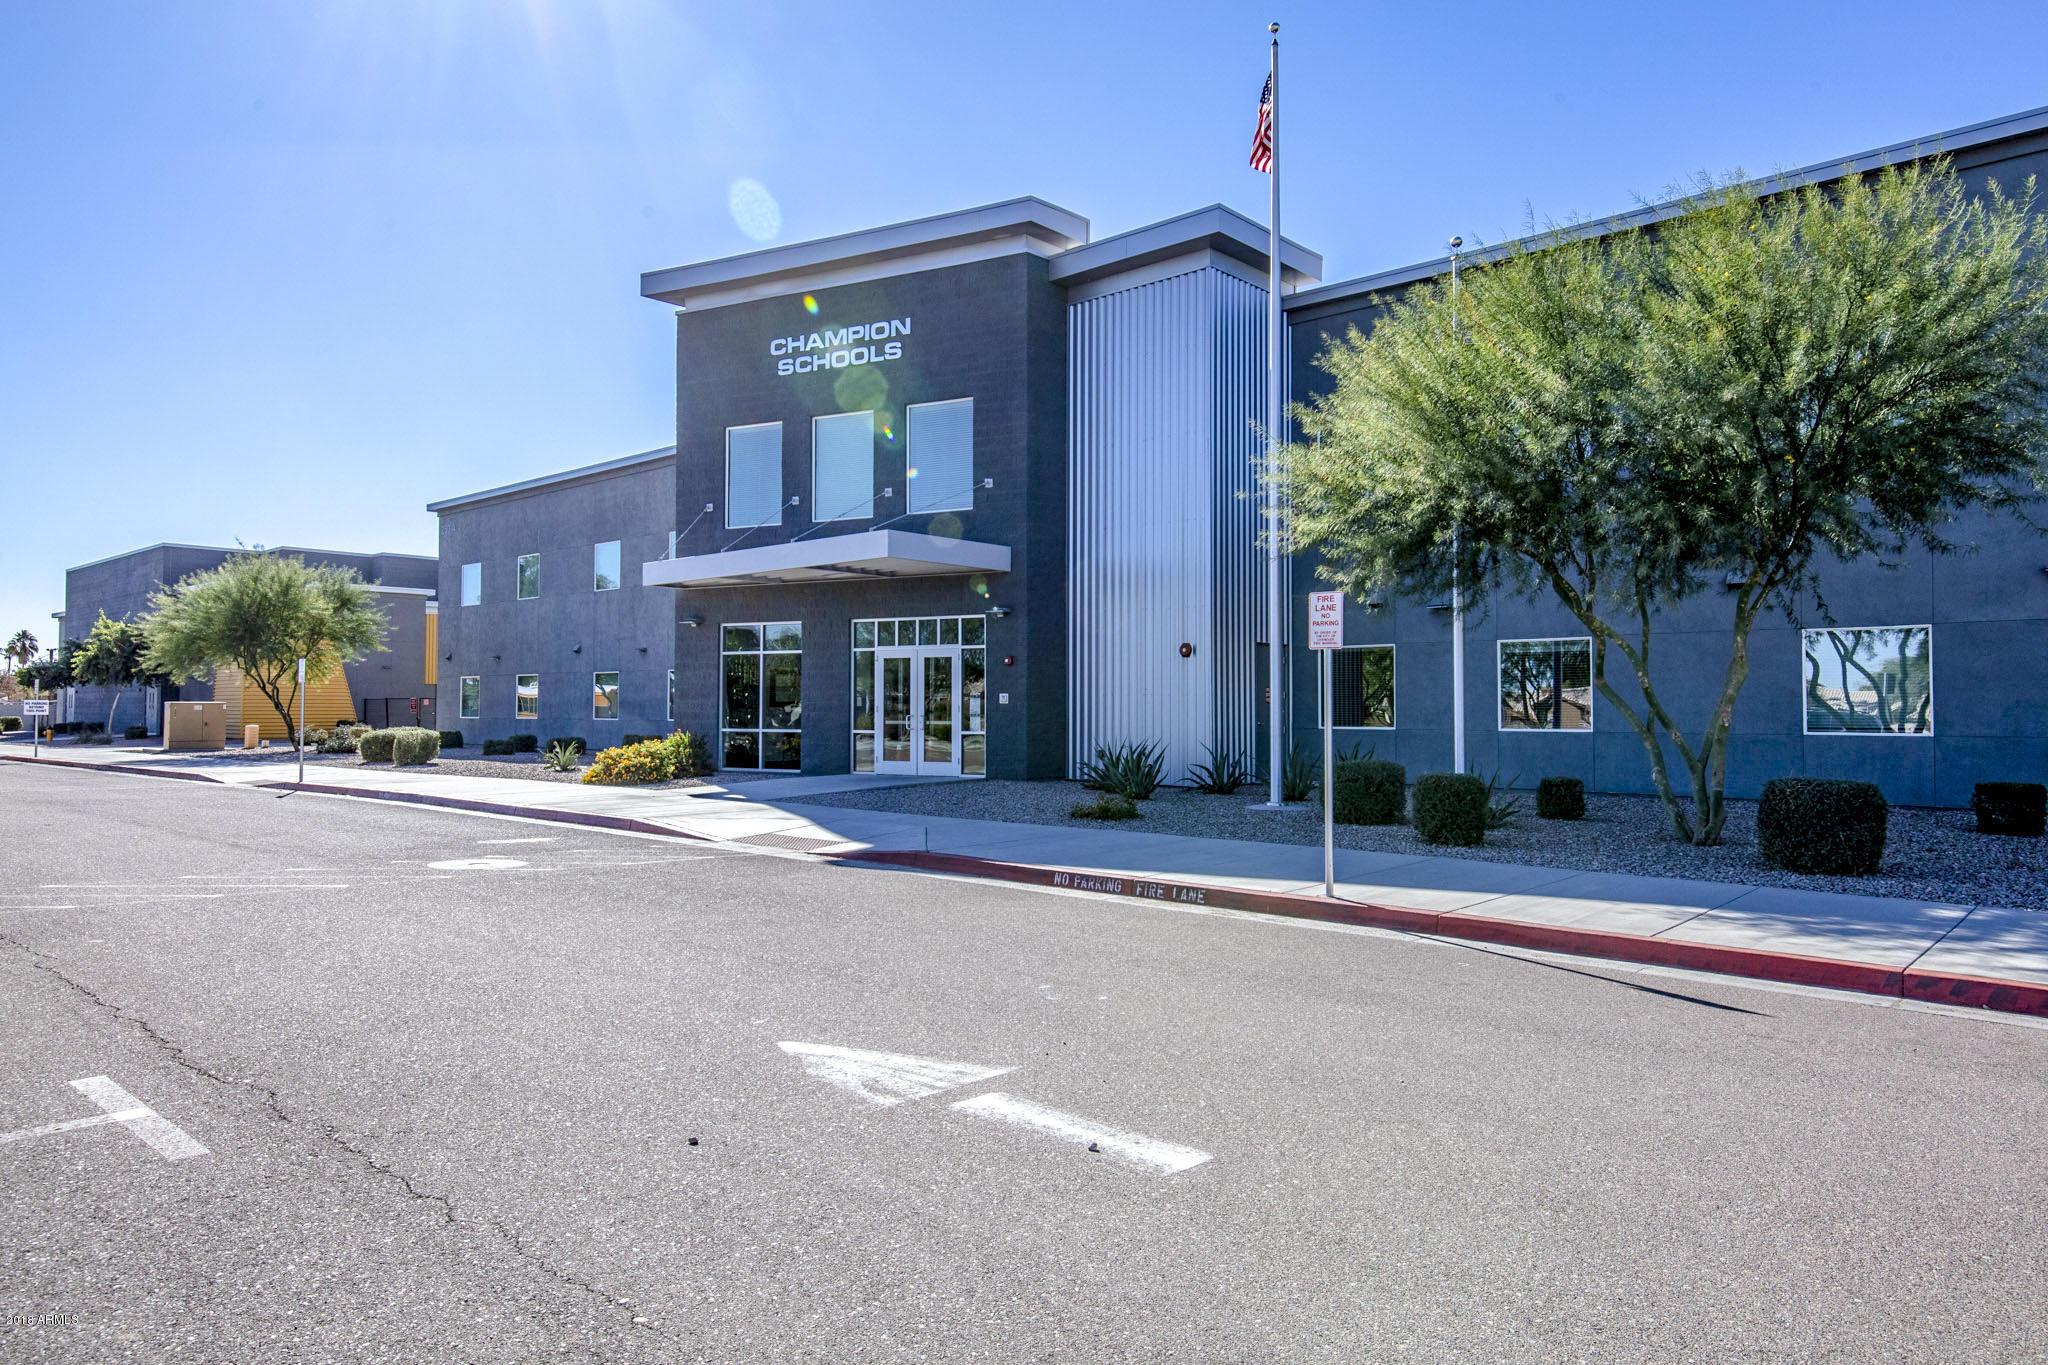 MLS 5847102 201 S CROSSCREEK Drive, Chandler, AZ 85225 Chandler AZ The Springs